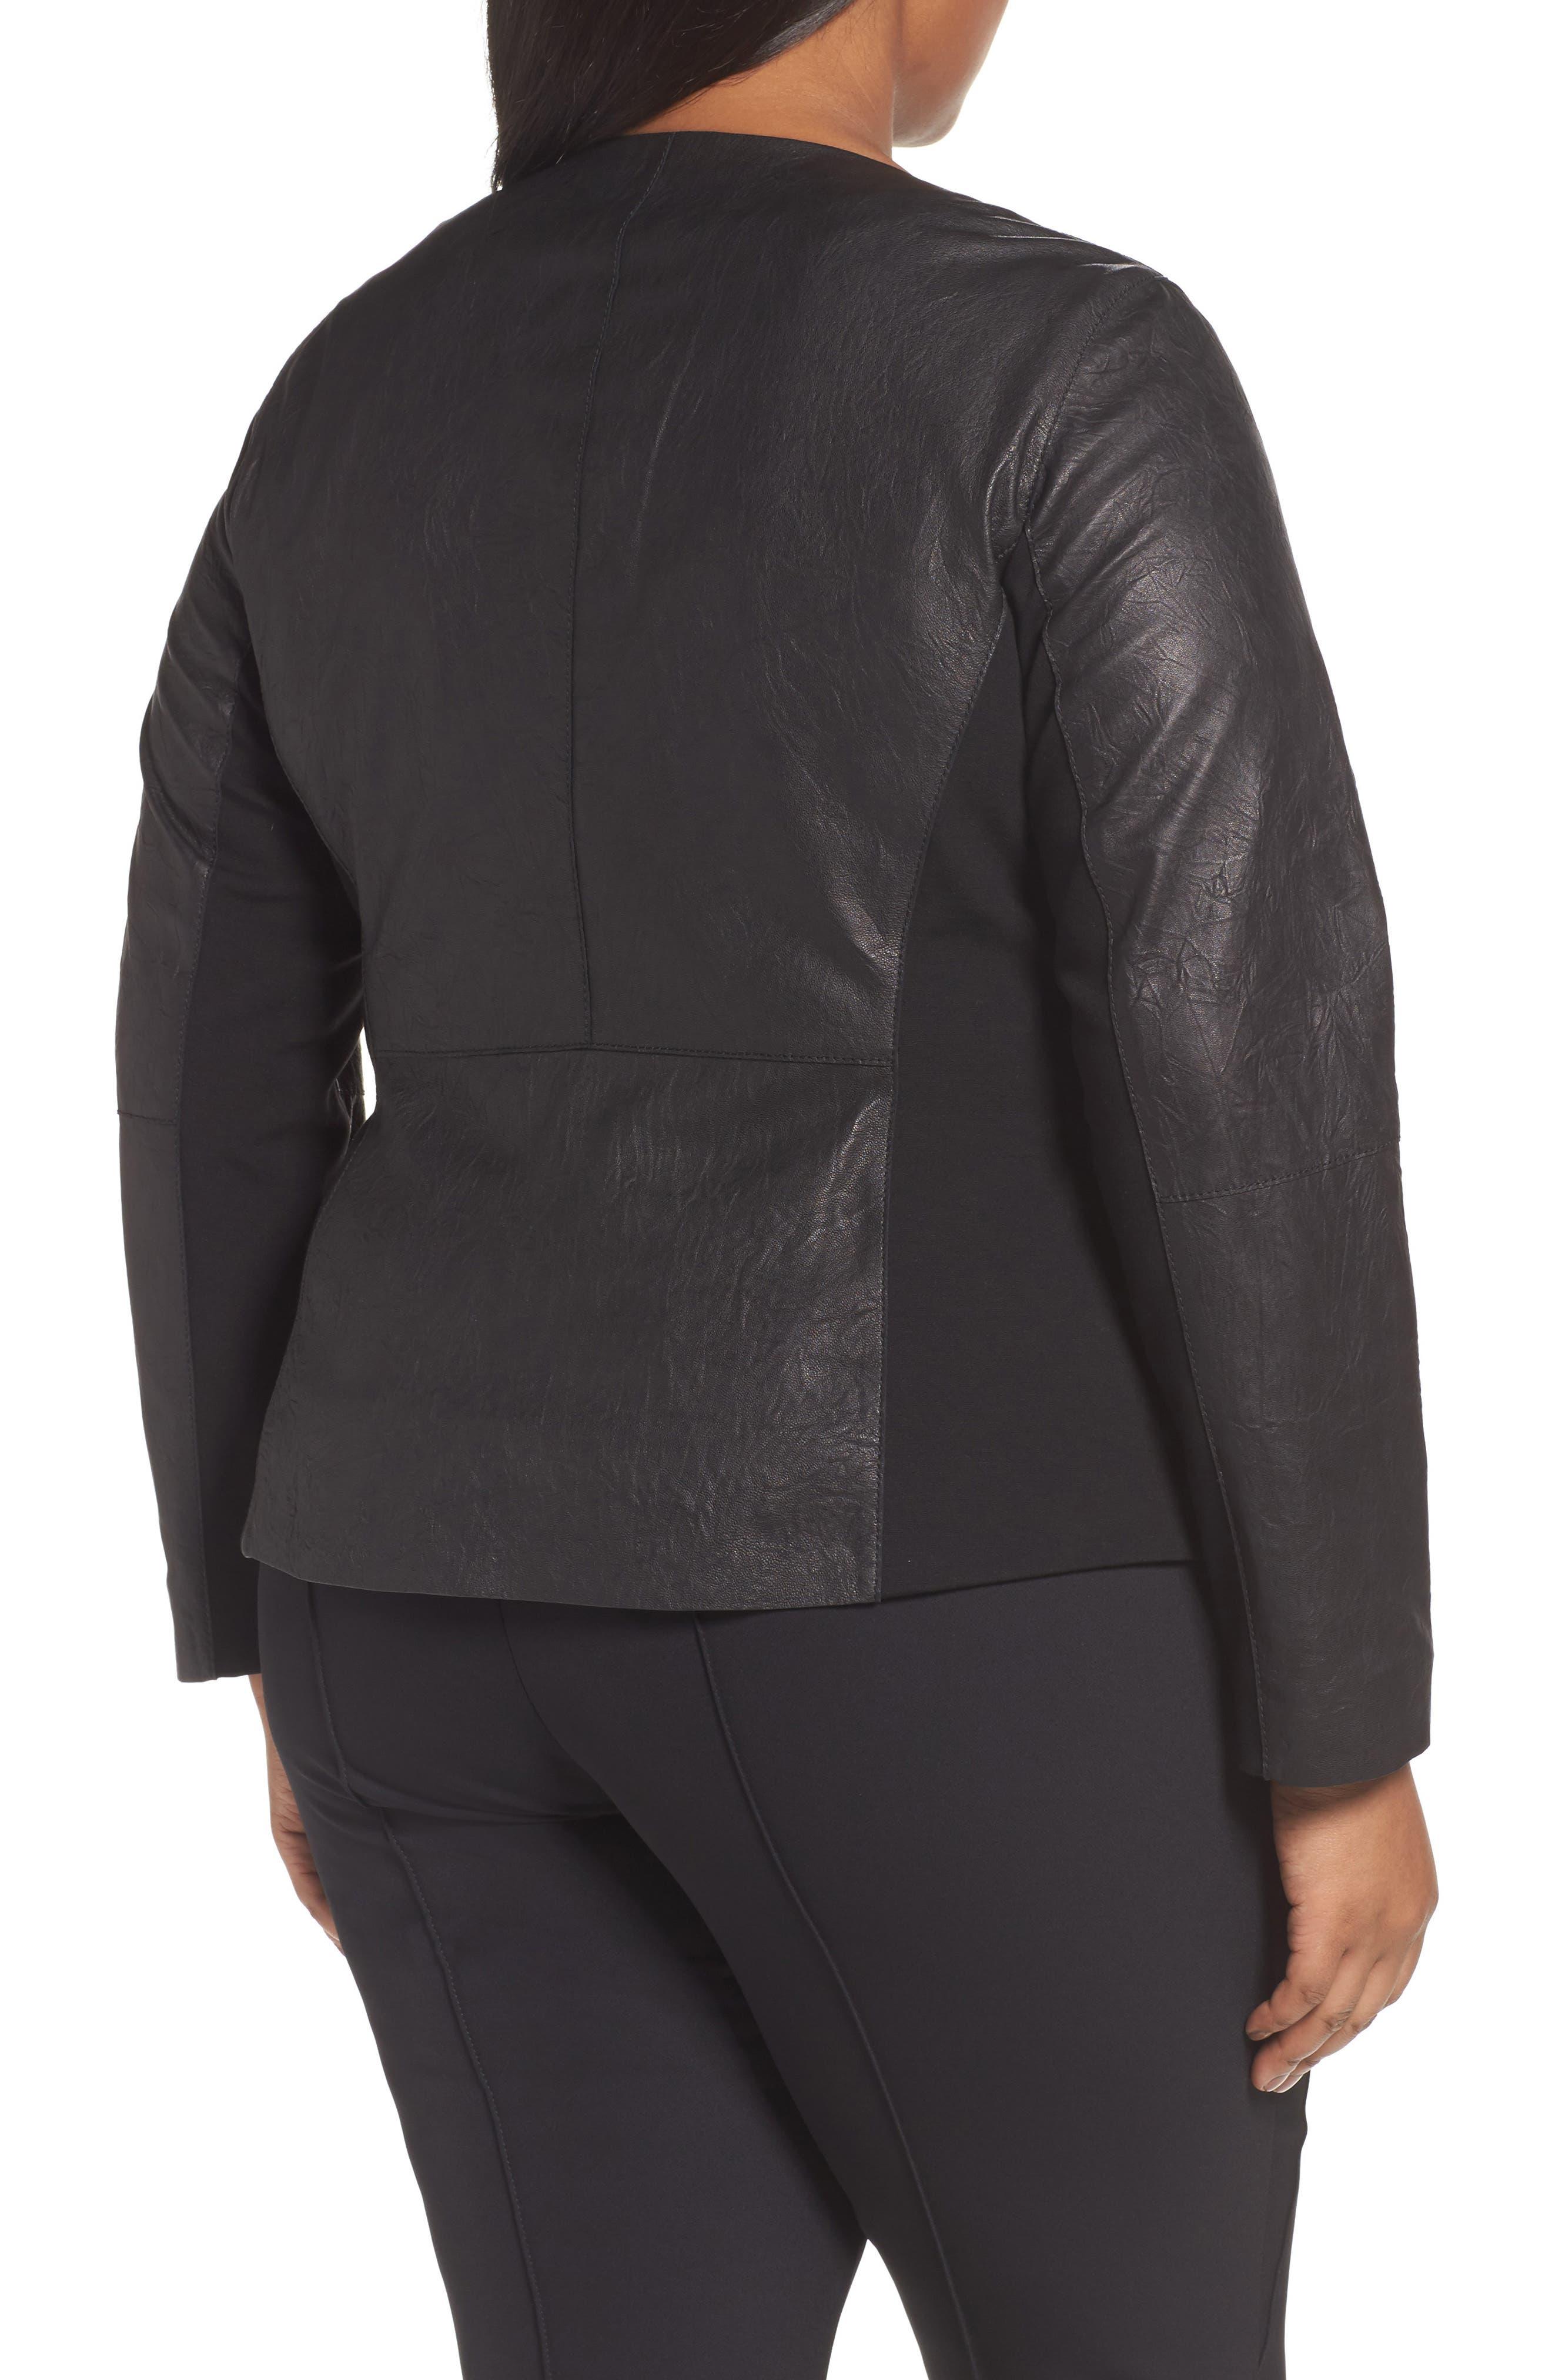 Aimes Leather Jacket,                             Alternate thumbnail 2, color,                             Black